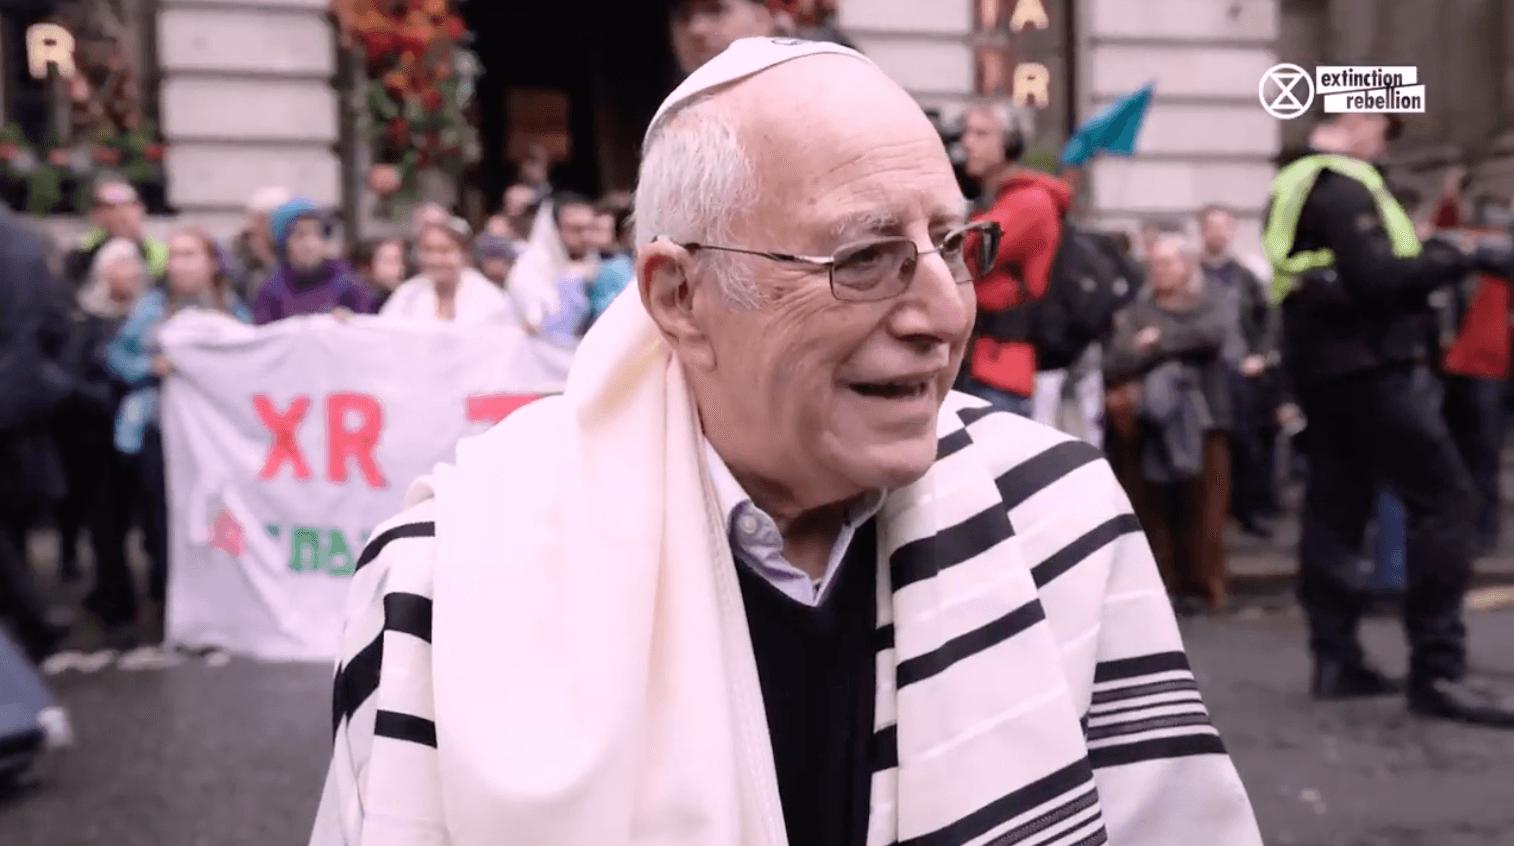 Still of Rabbi Jeffrey Newman at Extinction Rebellion protest, London 2019 (Video: Extinction Rebellion)